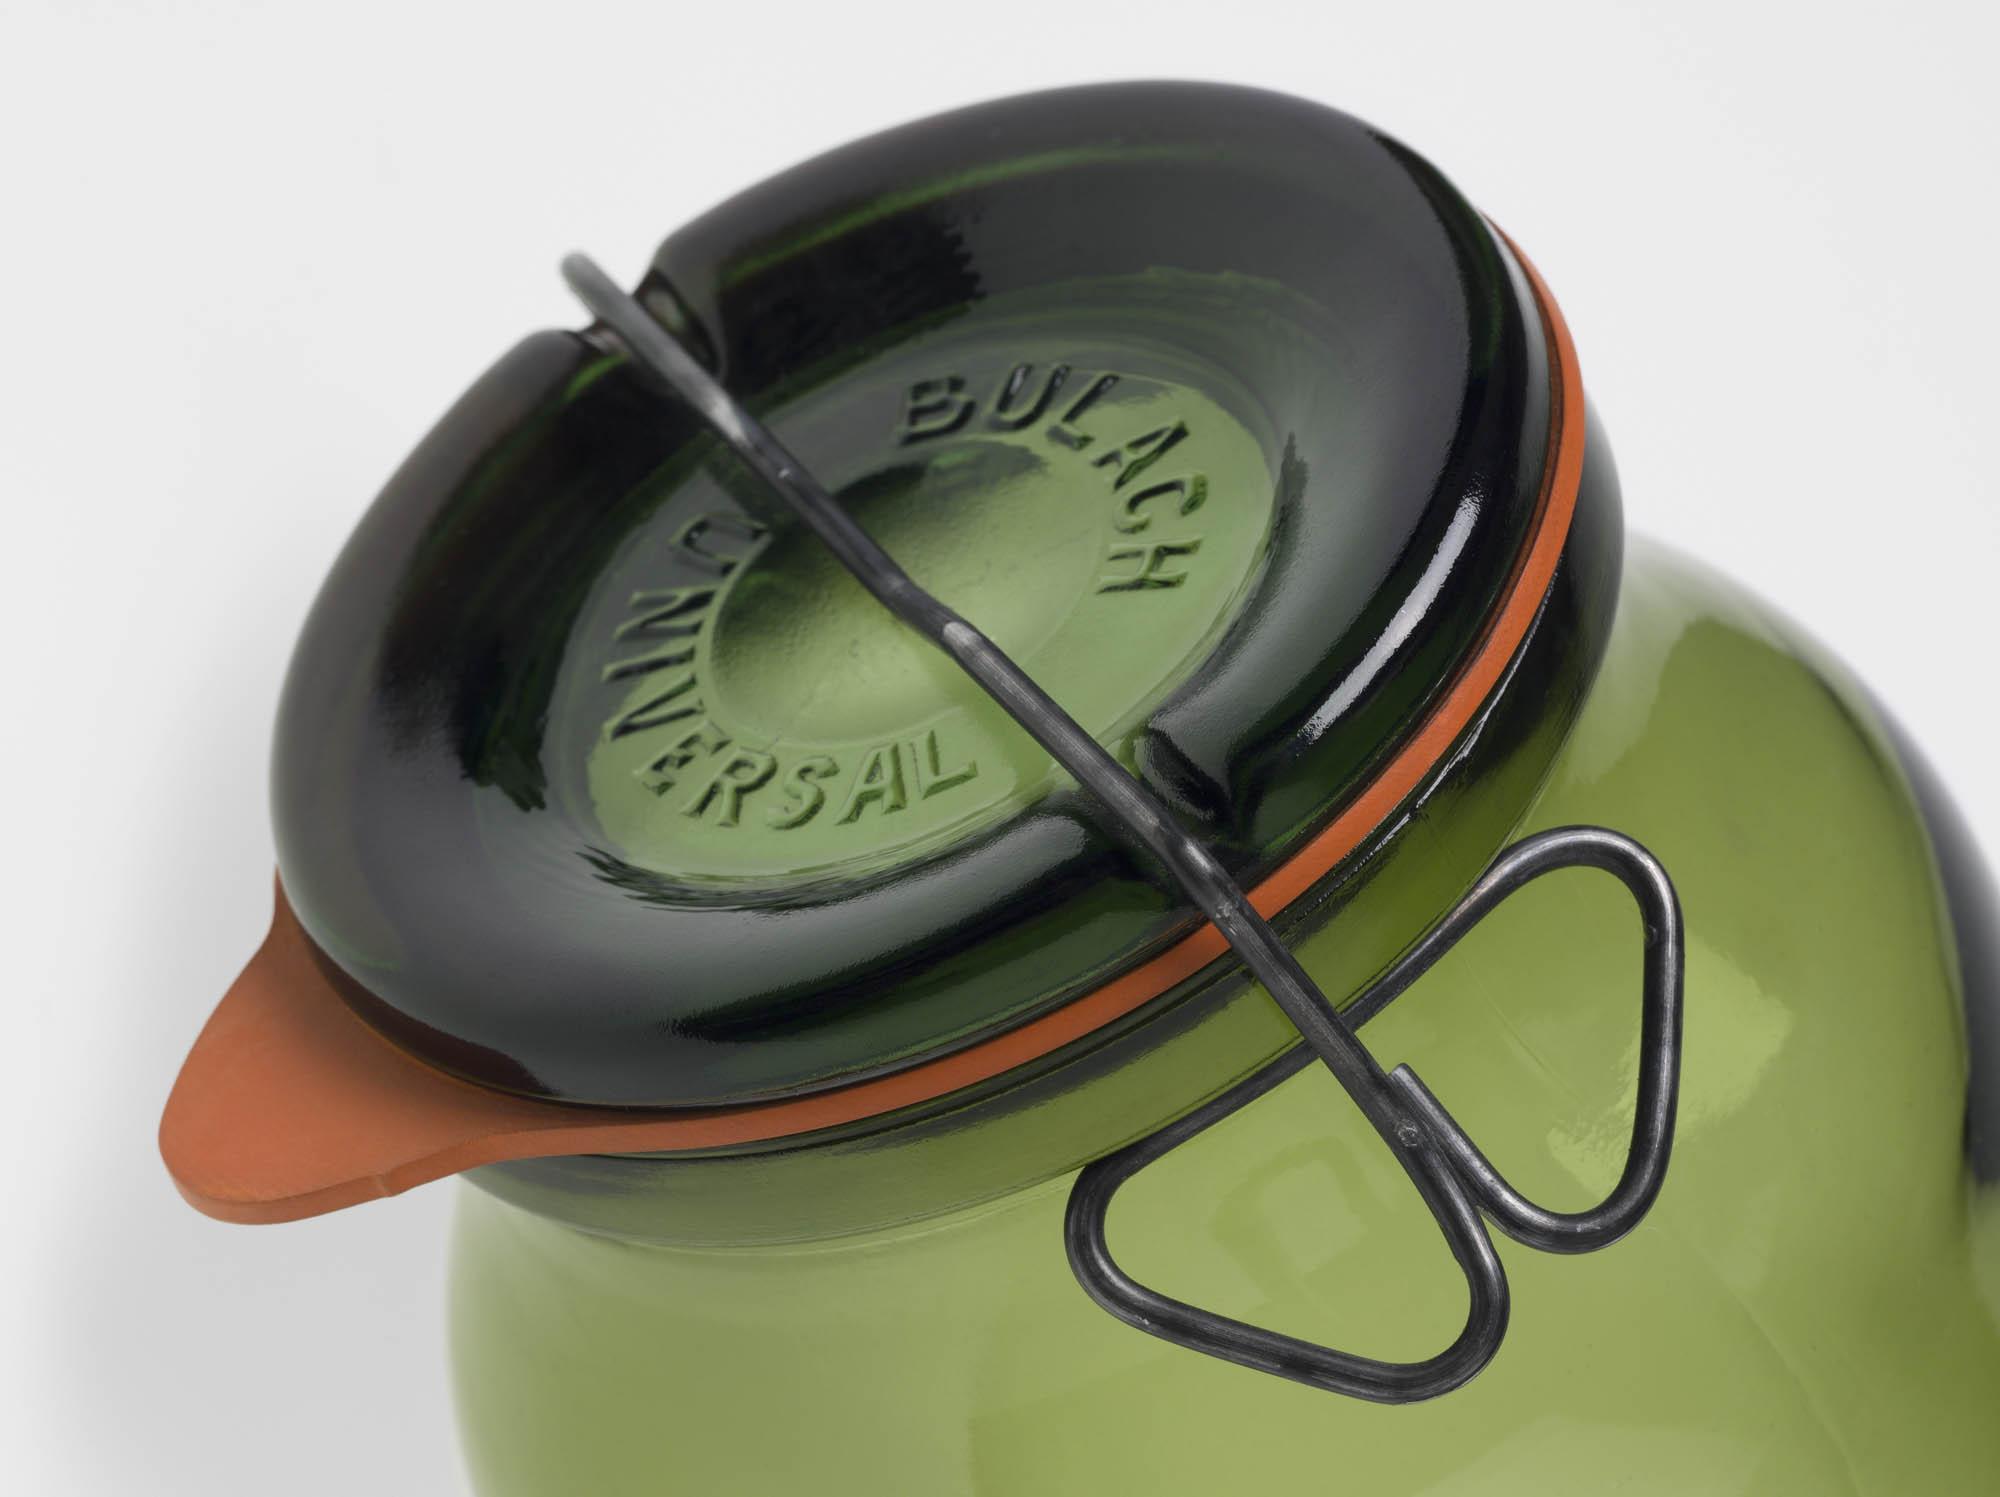 Universal-Konservenglas Bülach Glashütte Bülach AG Konservenglas